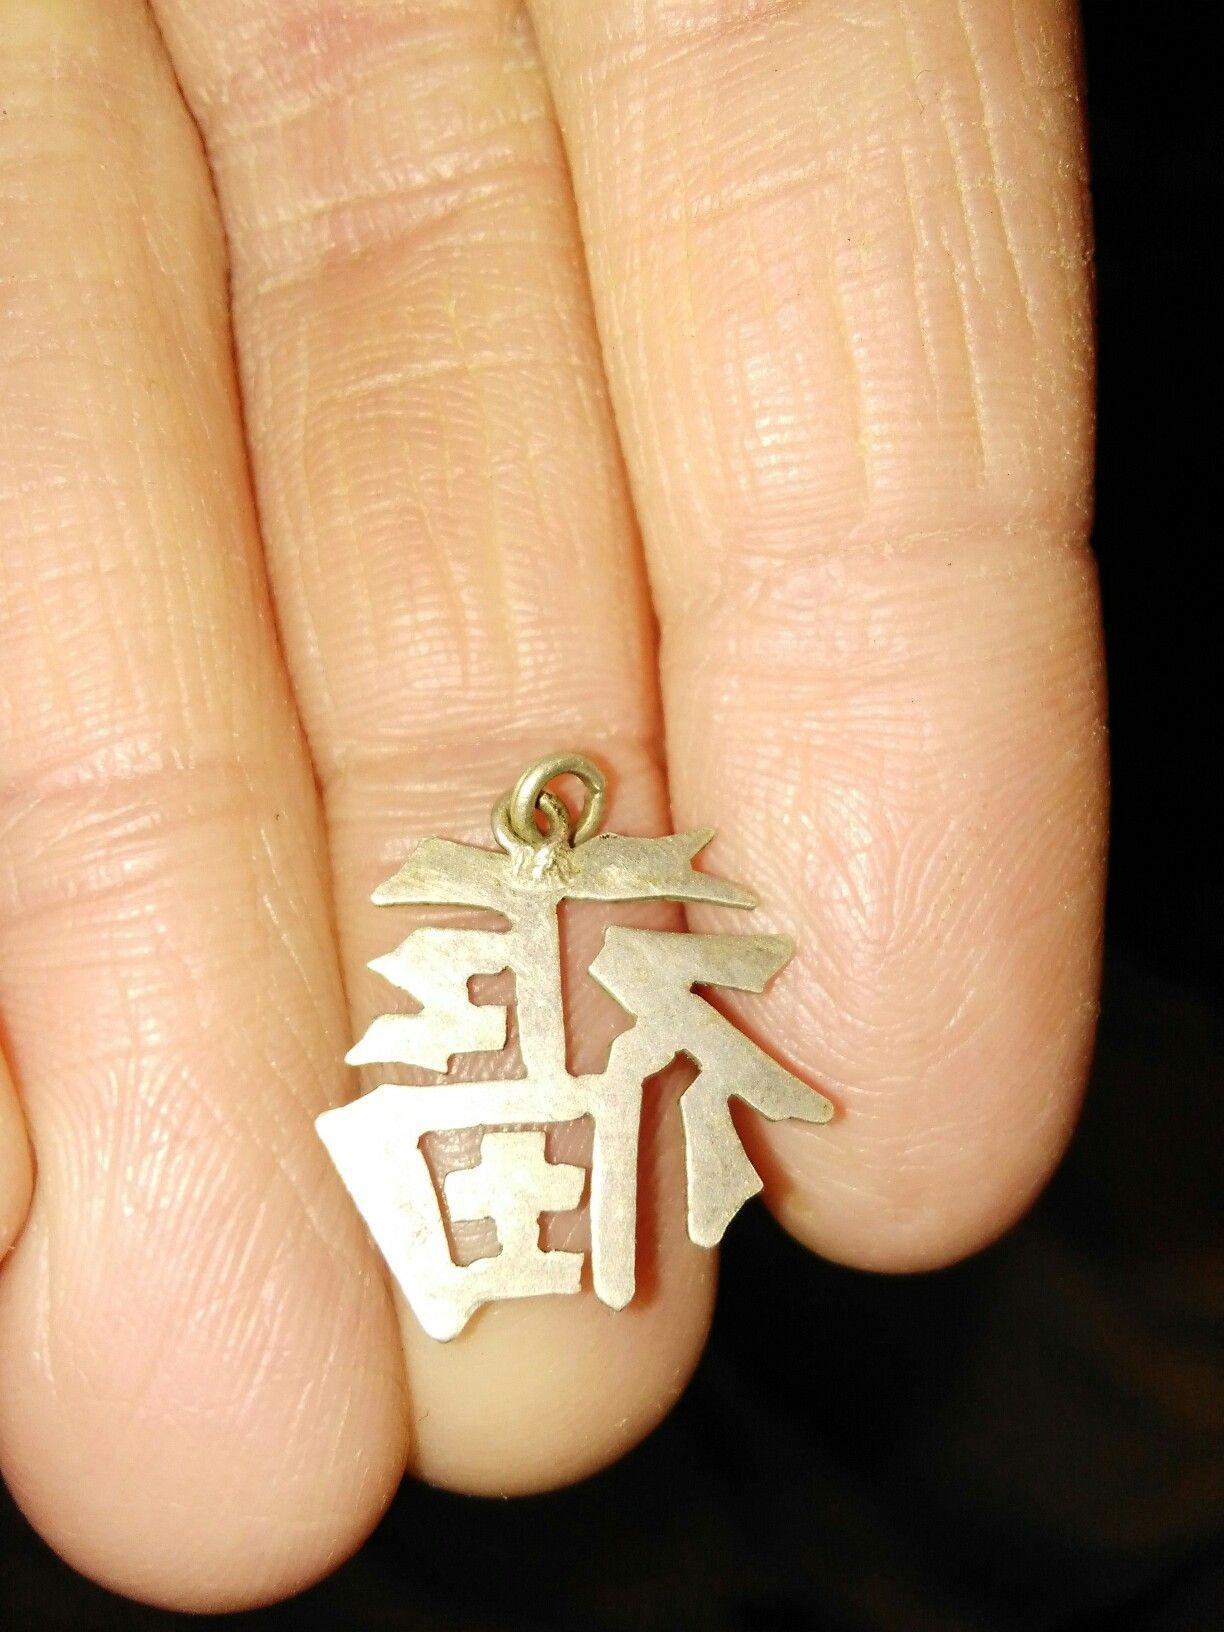 Pin By Sarah Cruz On Chinese Symbols Pinterest